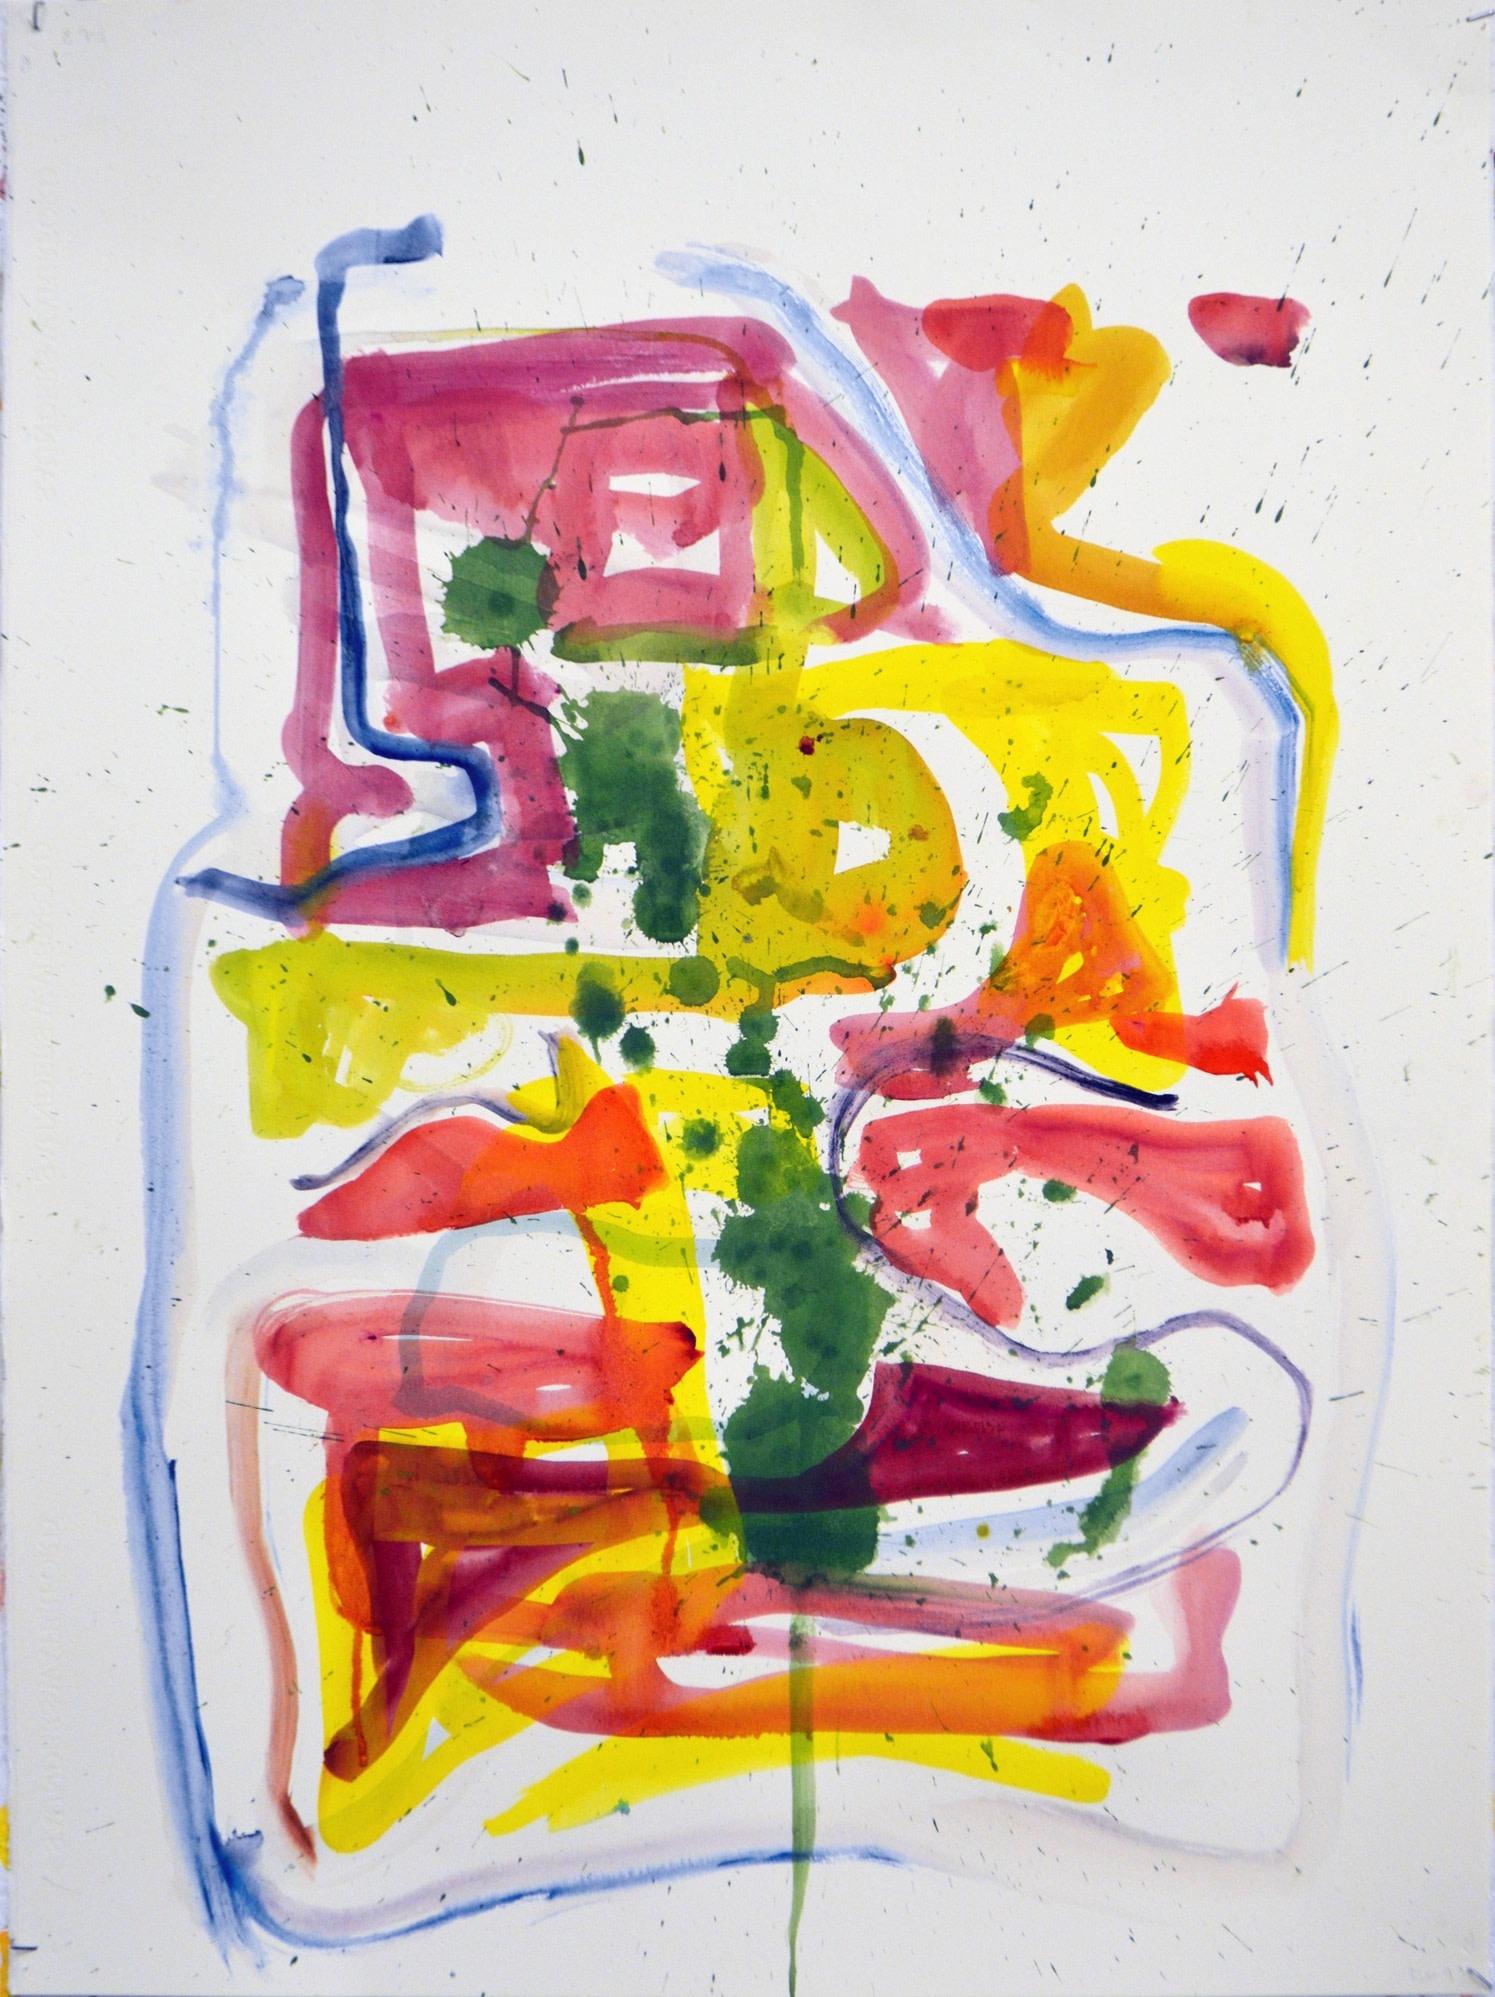 <span class=&#34;link fancybox-details-link&#34;><a href=&#34;/exhibitions/24/works/artworks_standalone10706/&#34;>View Detail Page</a></span><div class=&#34;artist&#34;><span class=&#34;artist&#34;><strong>James Faure Walker</strong></span></div><div class=&#34;title&#34;><em>Callard and Bowser</em></div><div class=&#34;medium&#34;>watercolour</div><div class=&#34;dimensions&#34;>100 x 80cm</div>